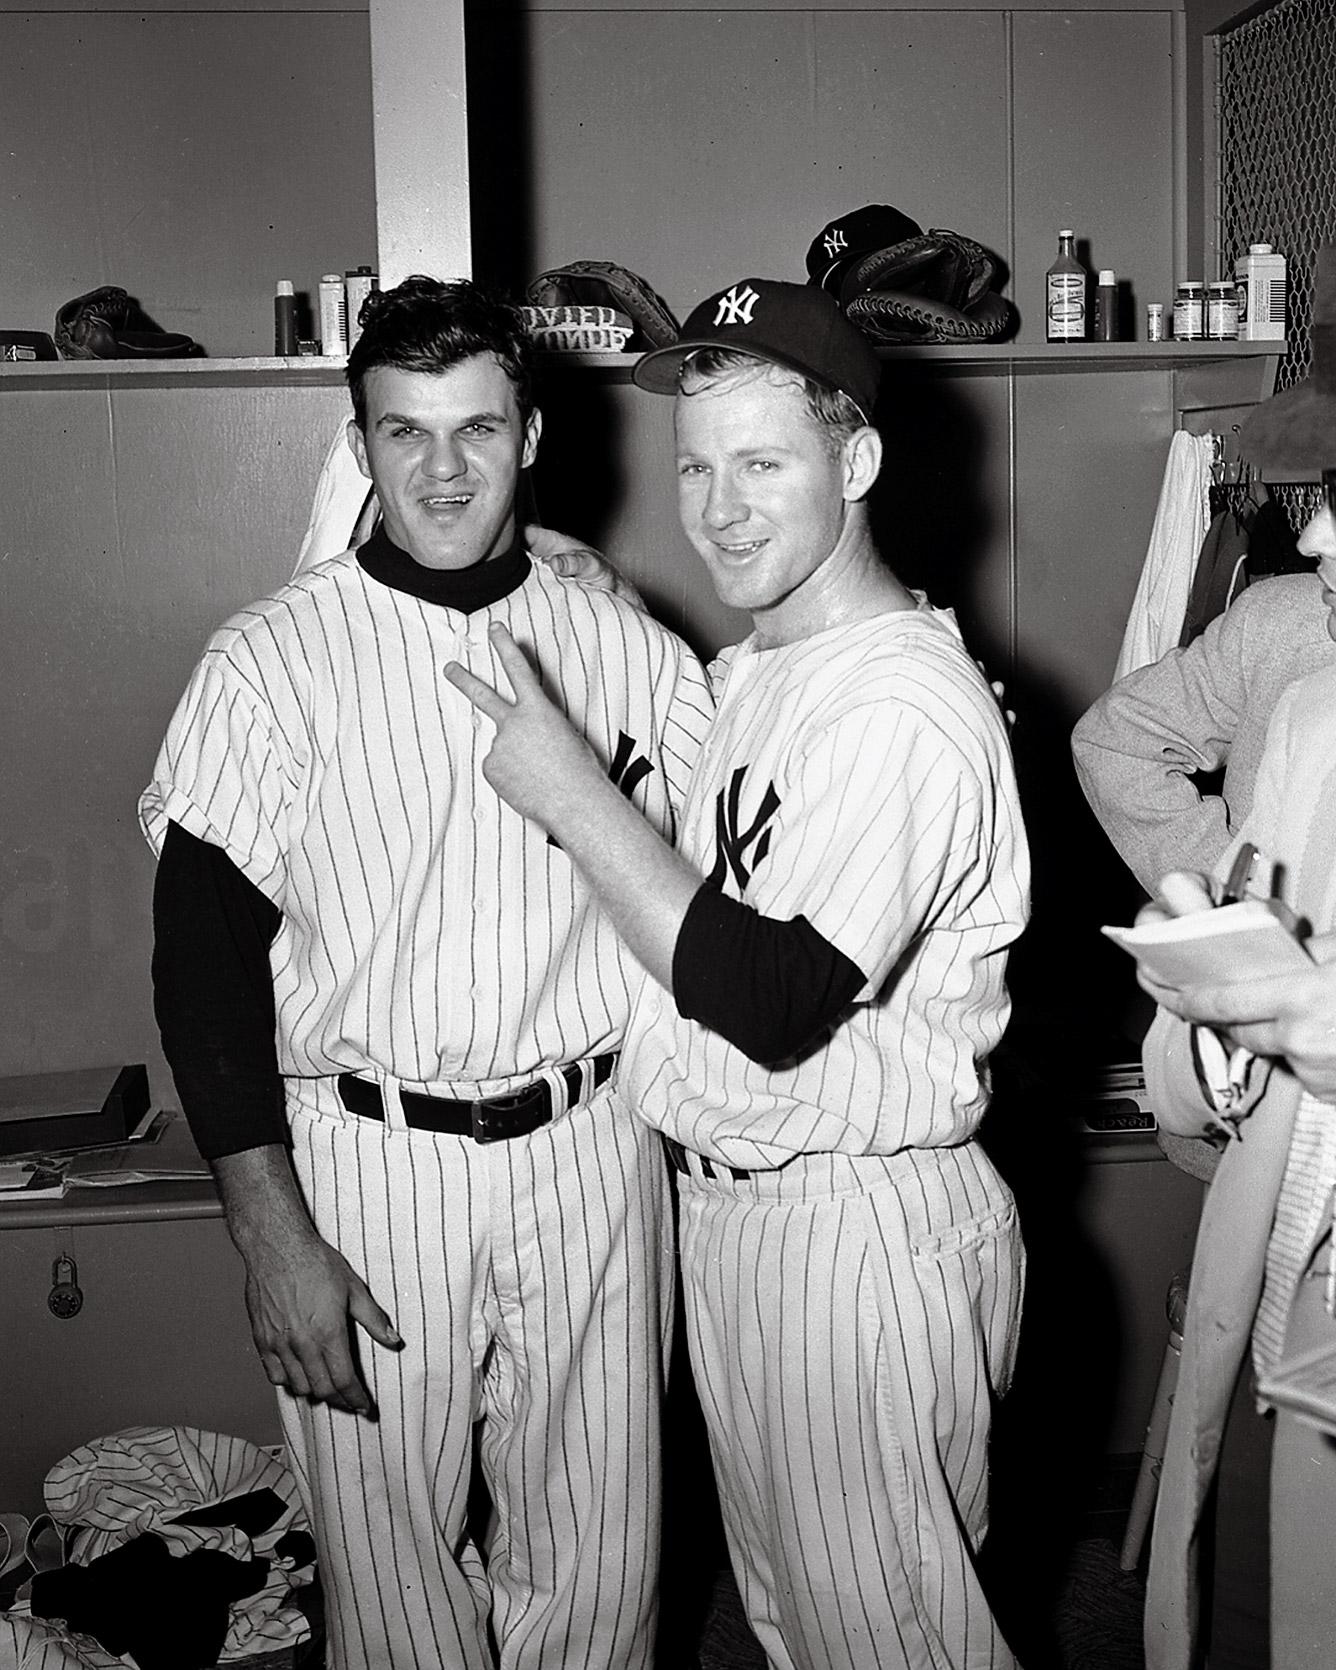 1955 Ford & Skowron